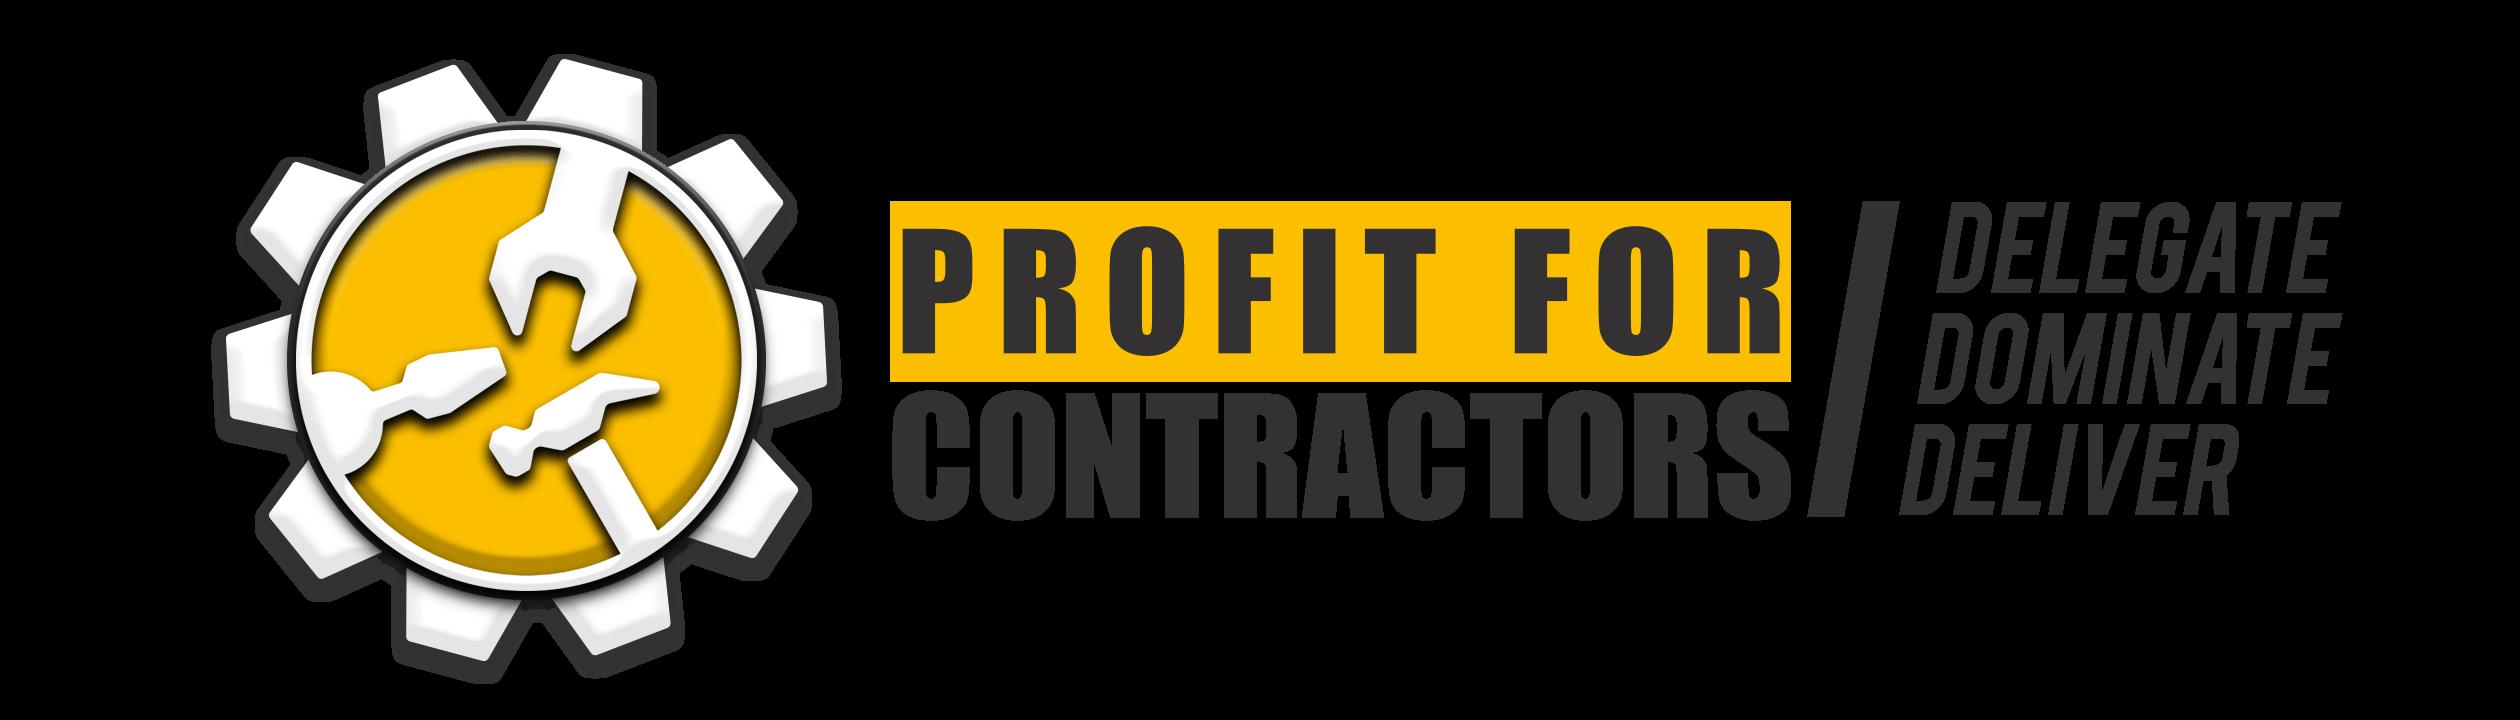 Profit For Contratcors